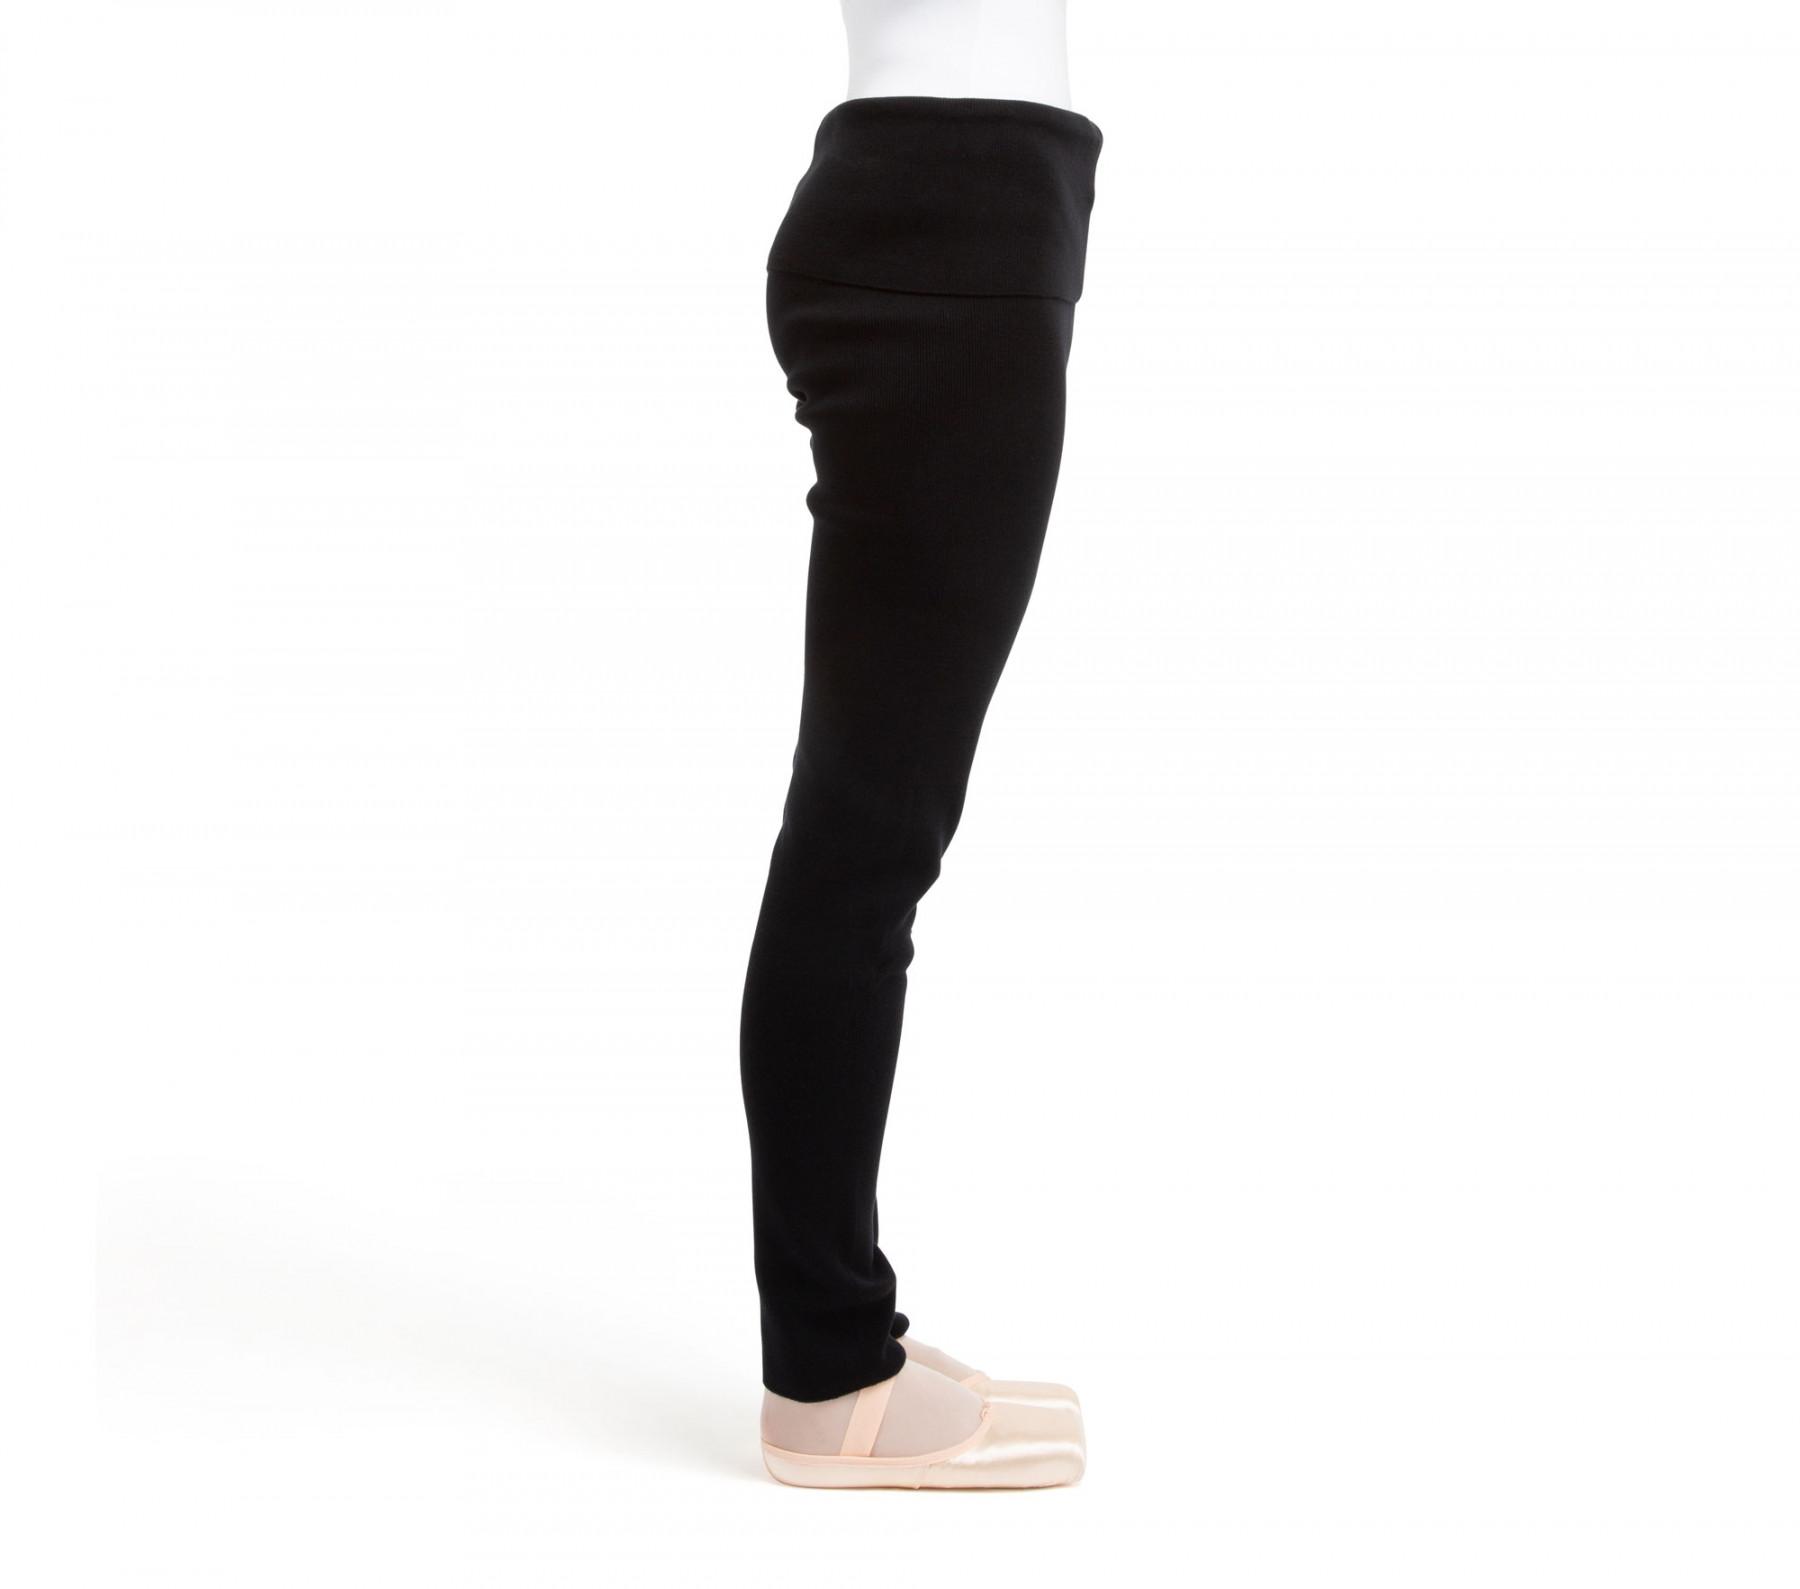 Gestrickte AufwArm-Leggings